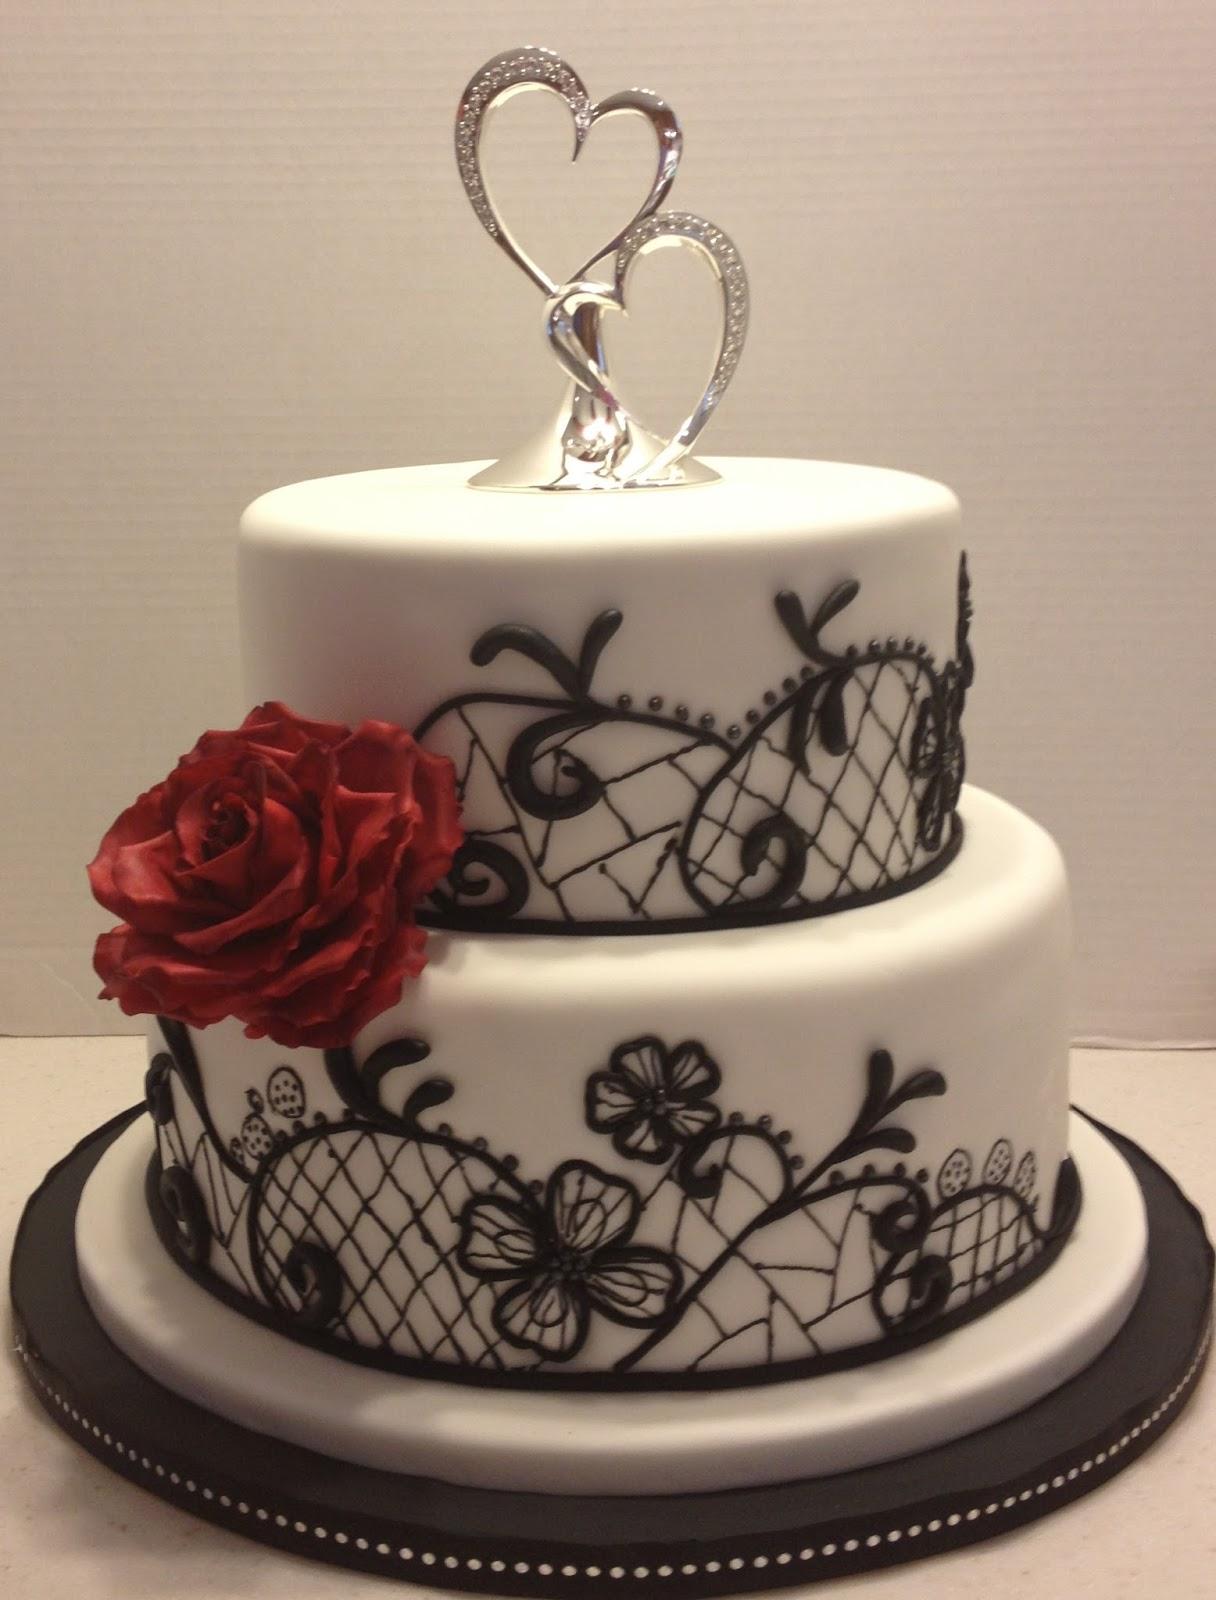 MaryMel Cakes: Black, white & red wedding